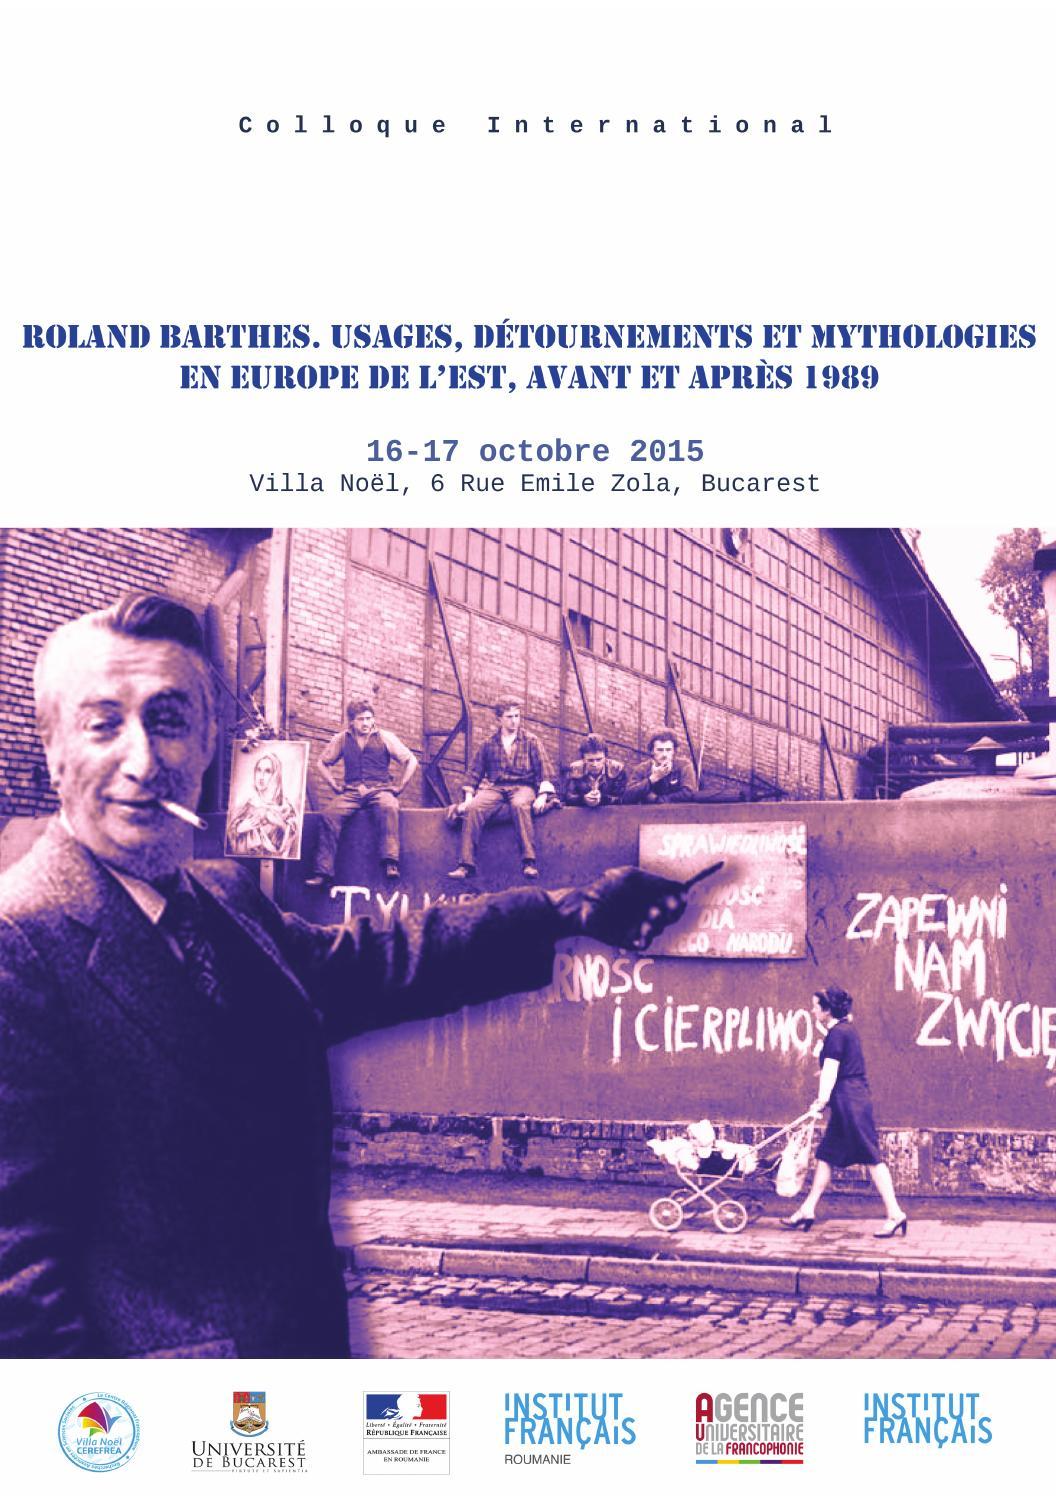 Centenarul roland barthes by institut fran ais issuu - Barthes la chambre claire ...